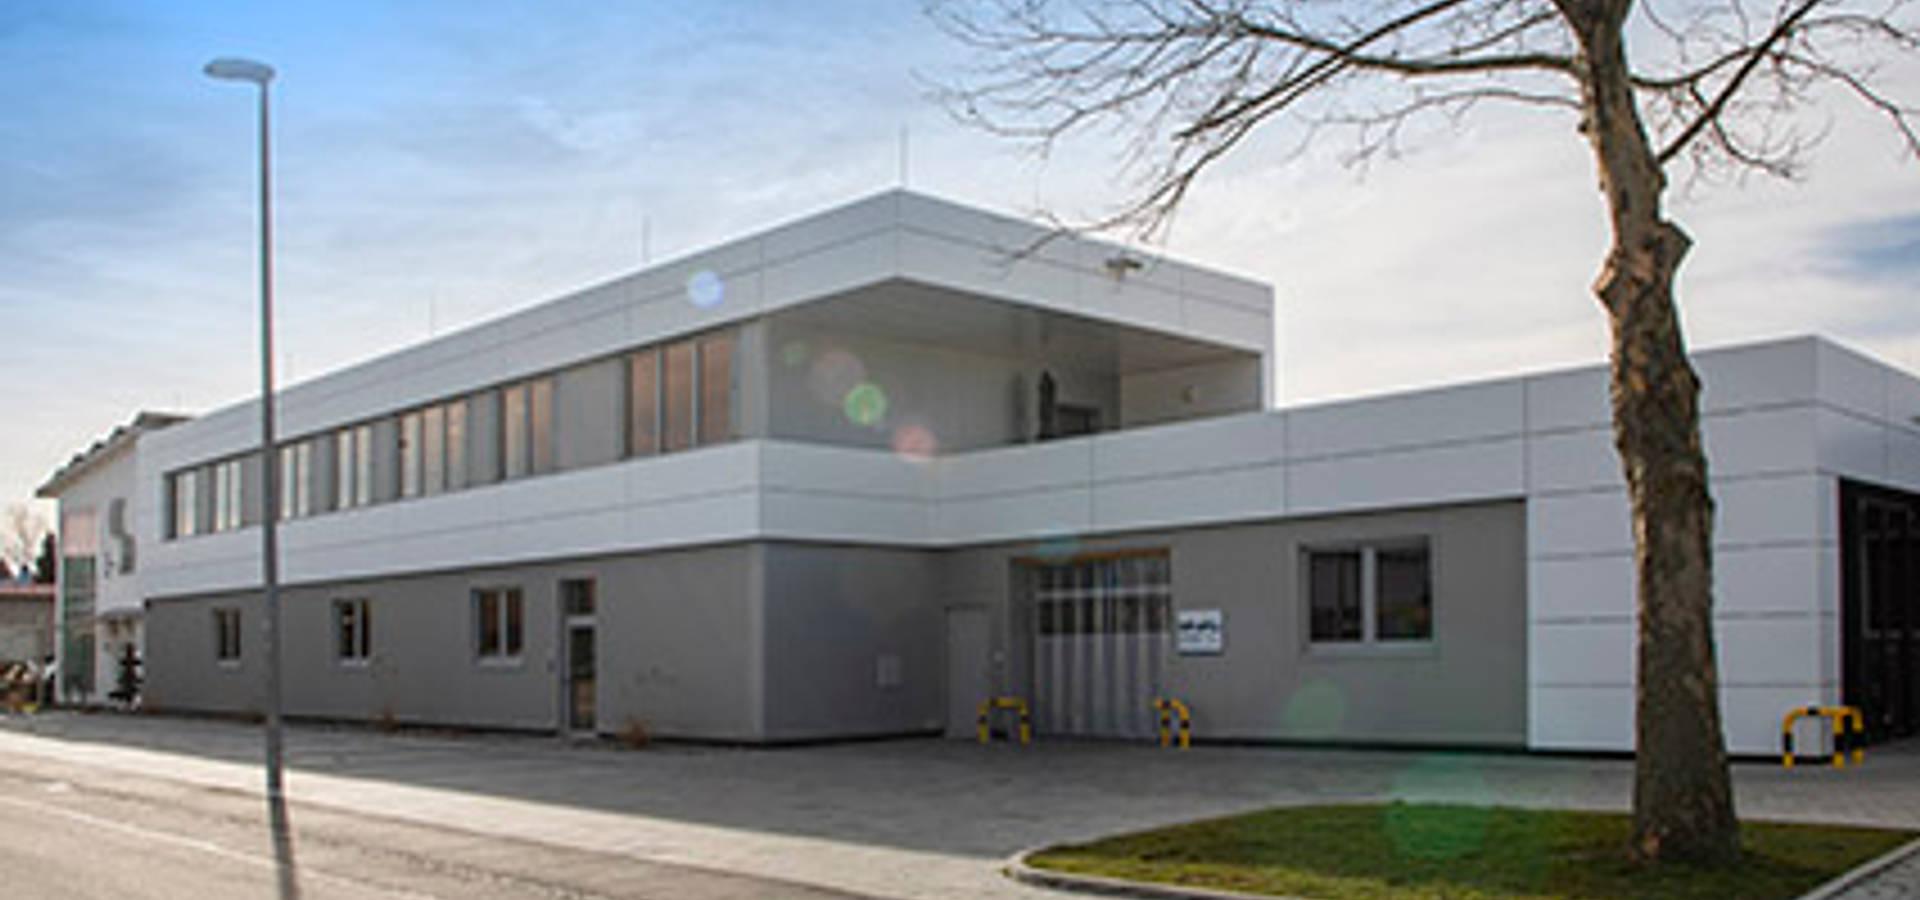 Markus Keßler Architektur